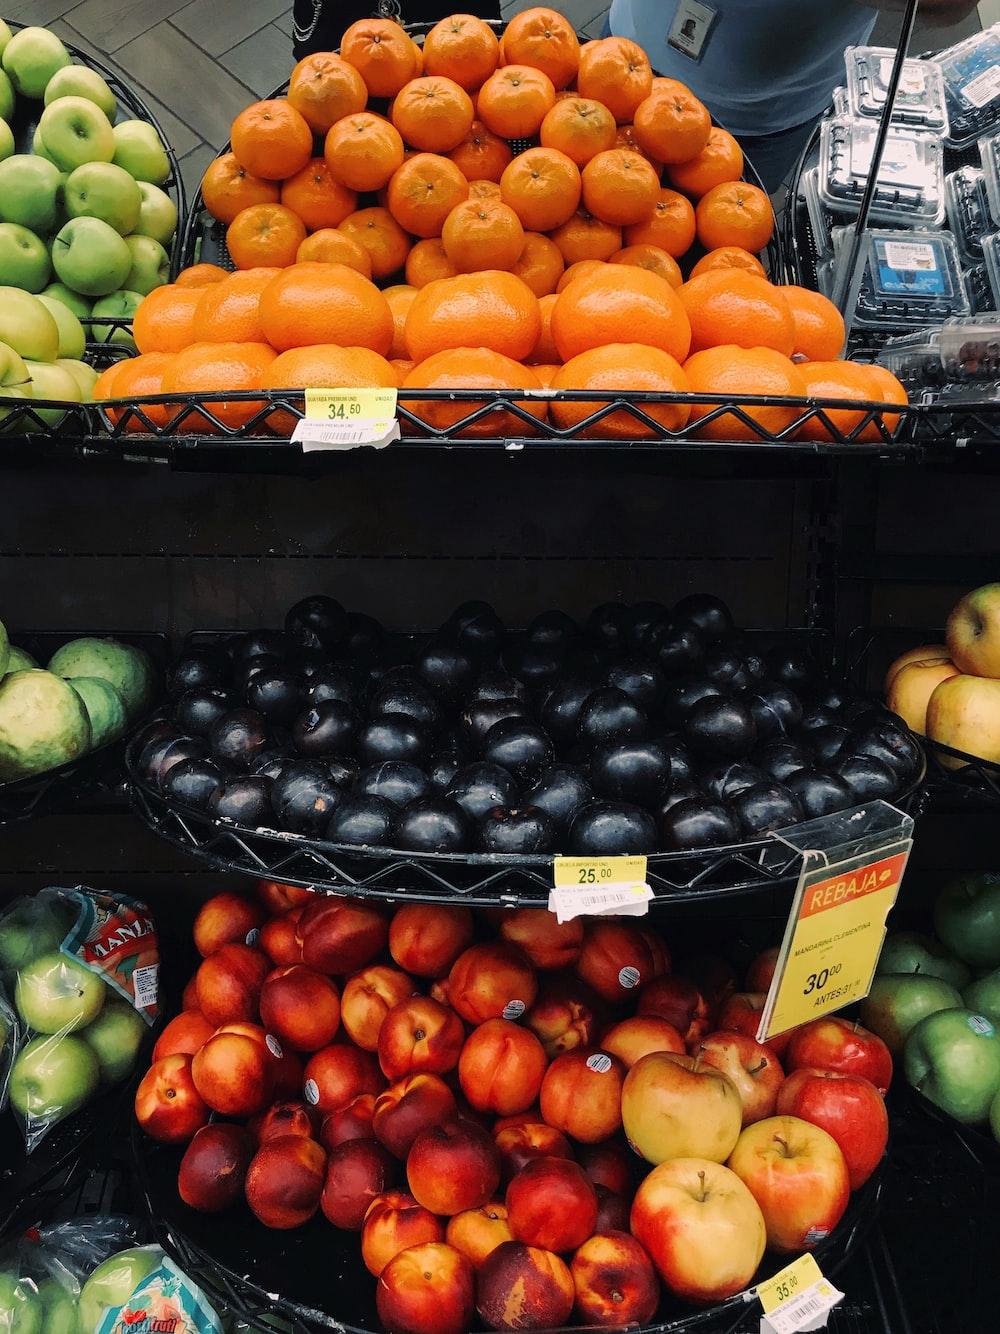 orange, black, and red fruits